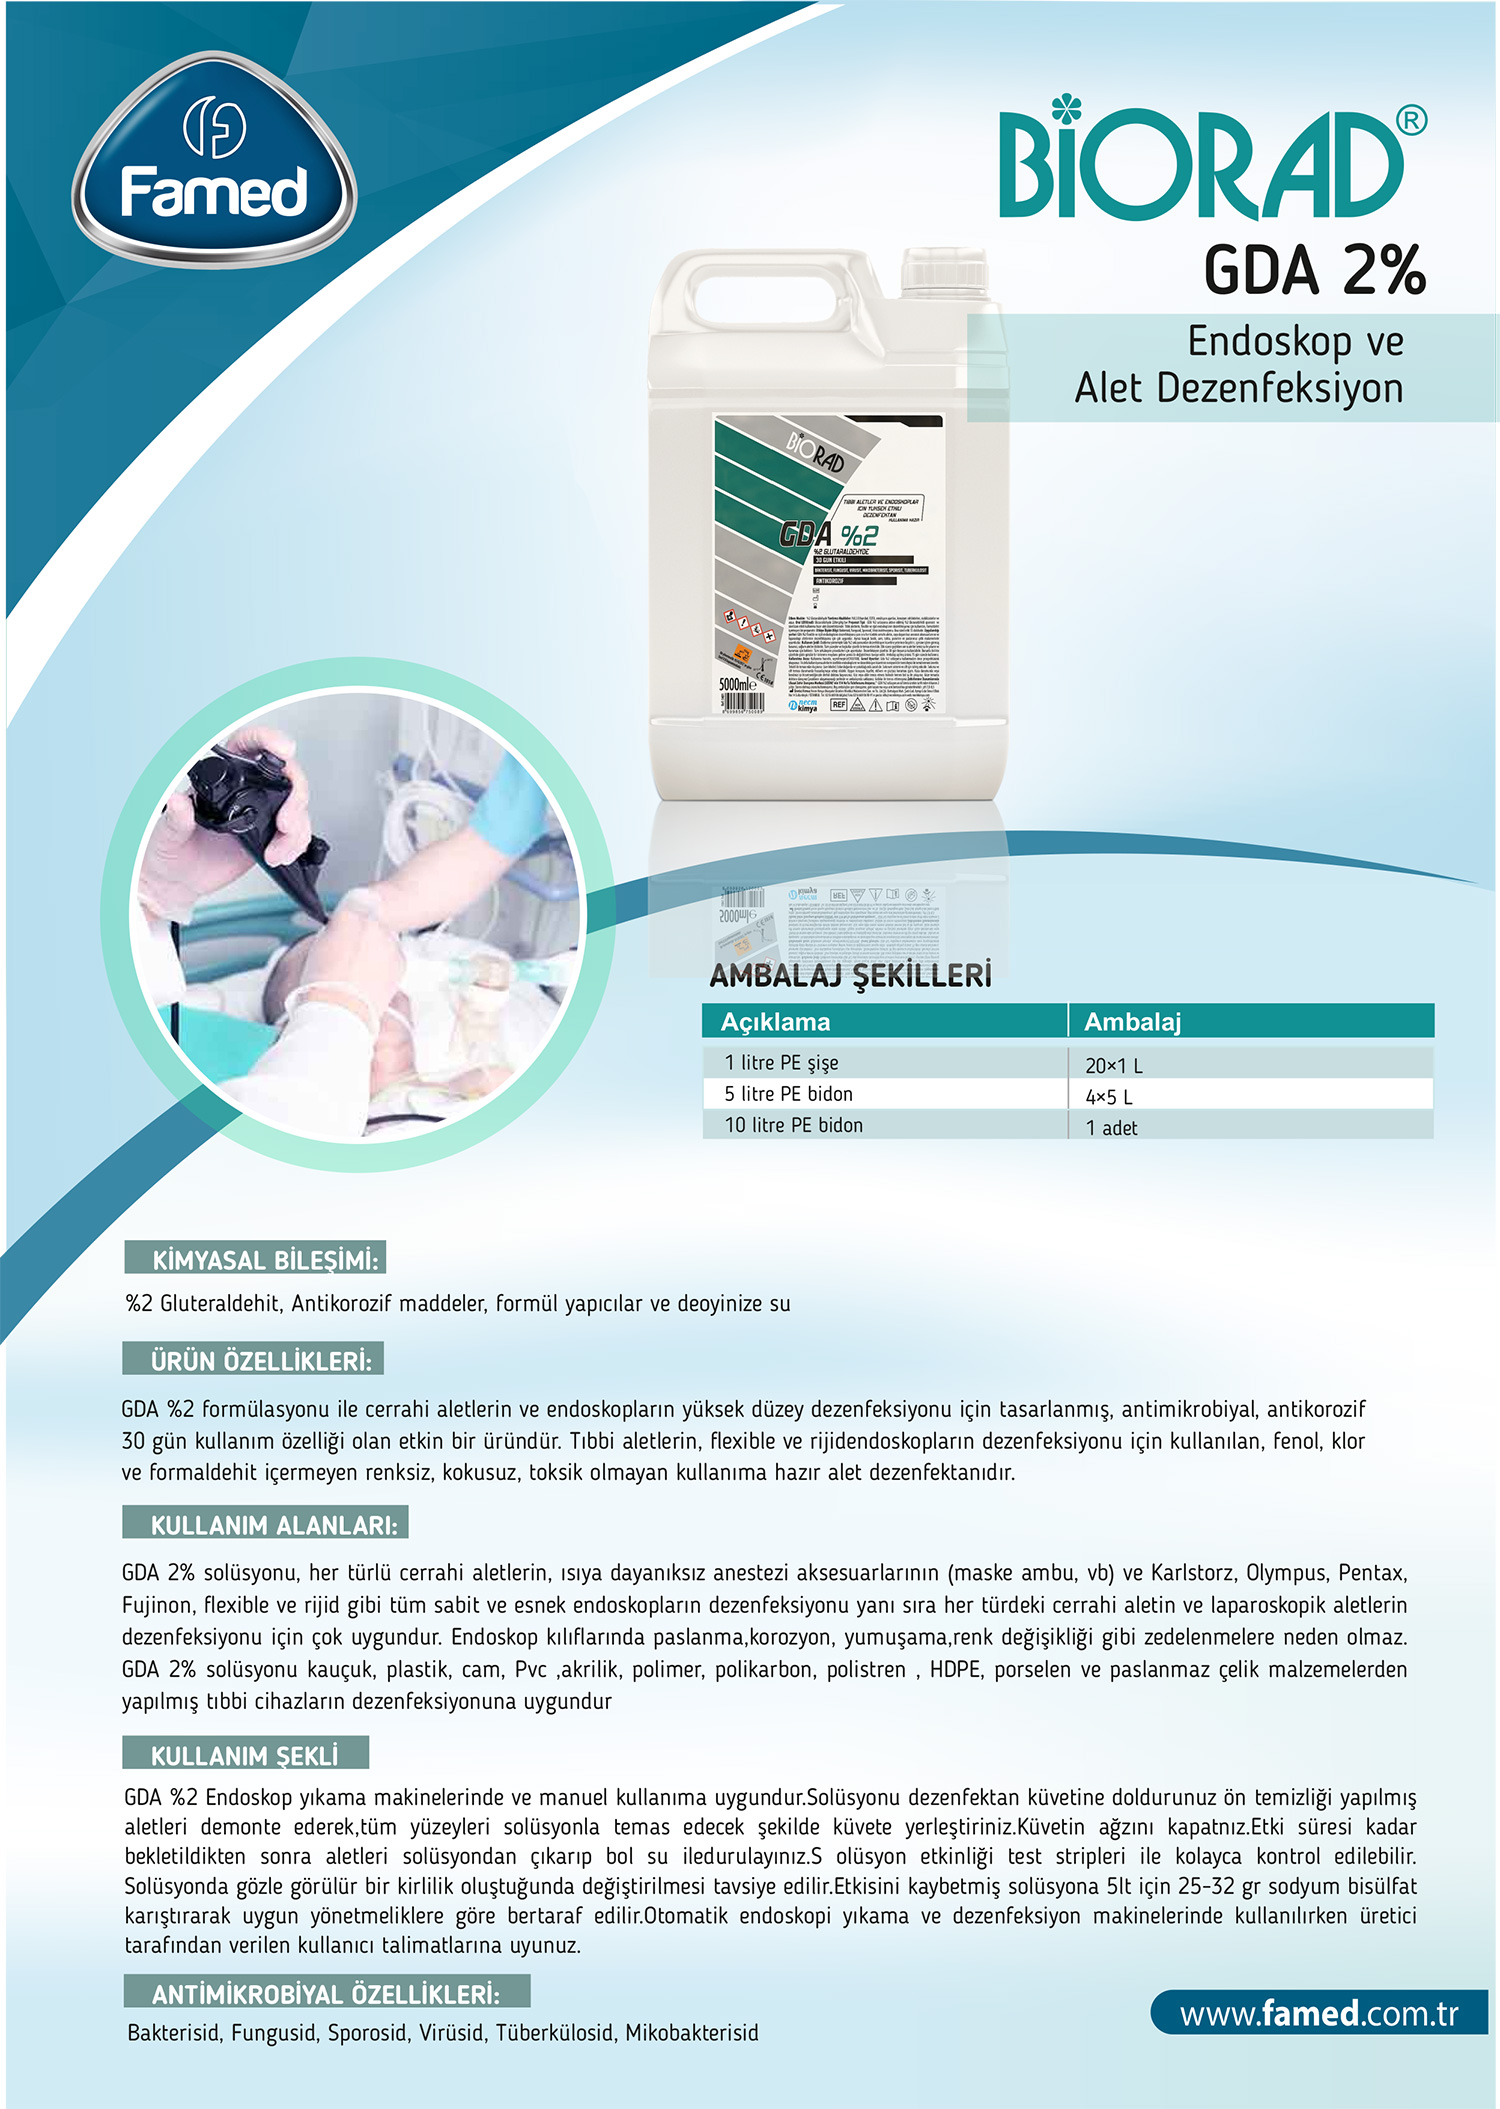 Yüksek Düzey Endoskopi ve Alet Dezenfektan GDA %2